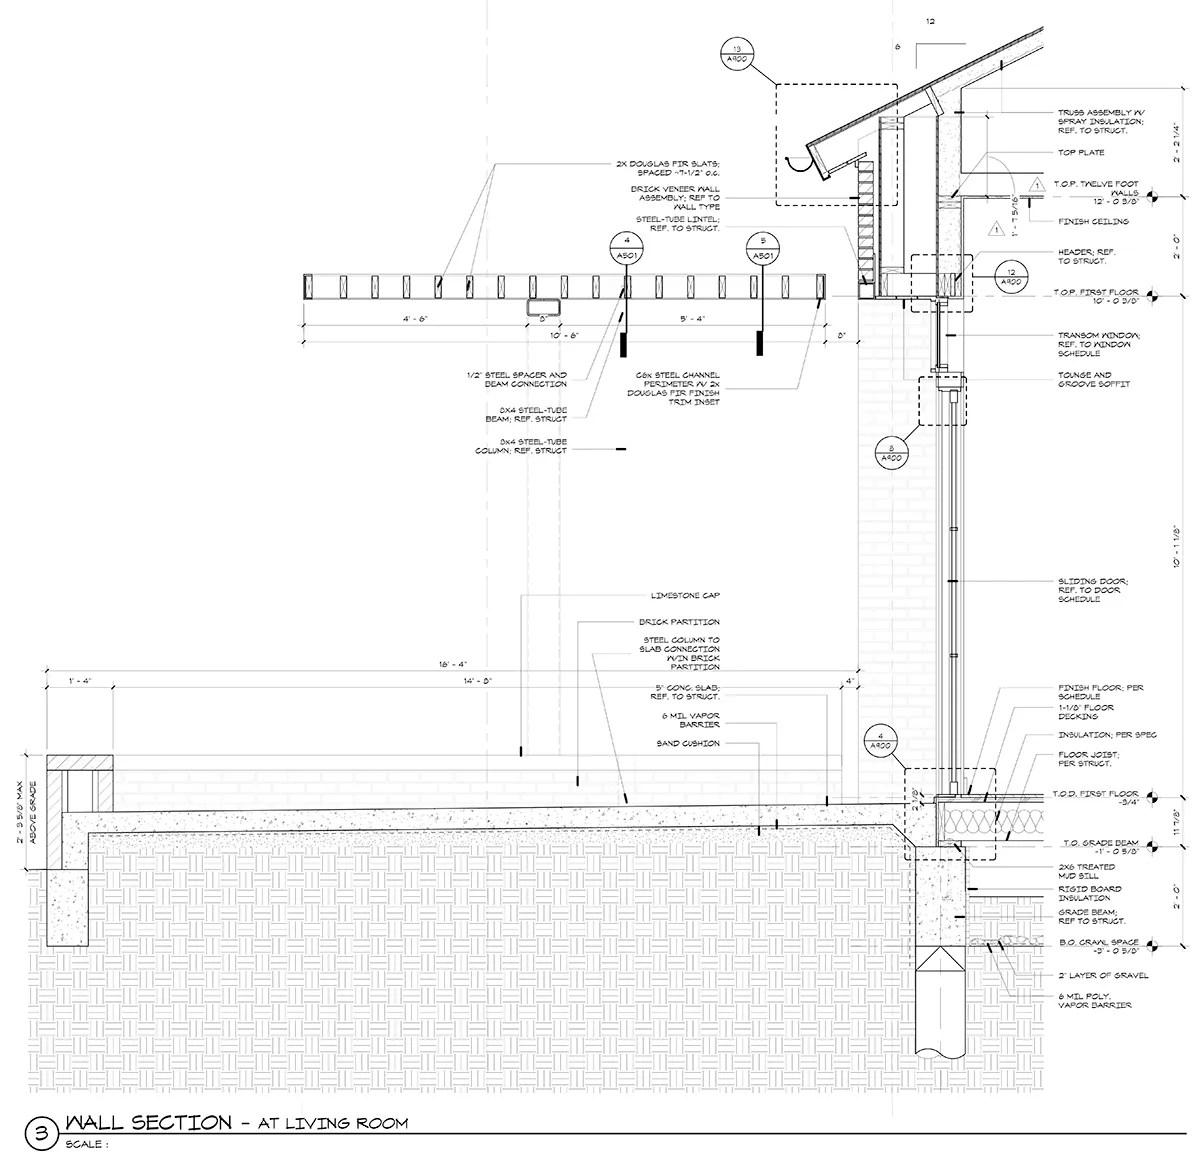 steel trellis - wall section